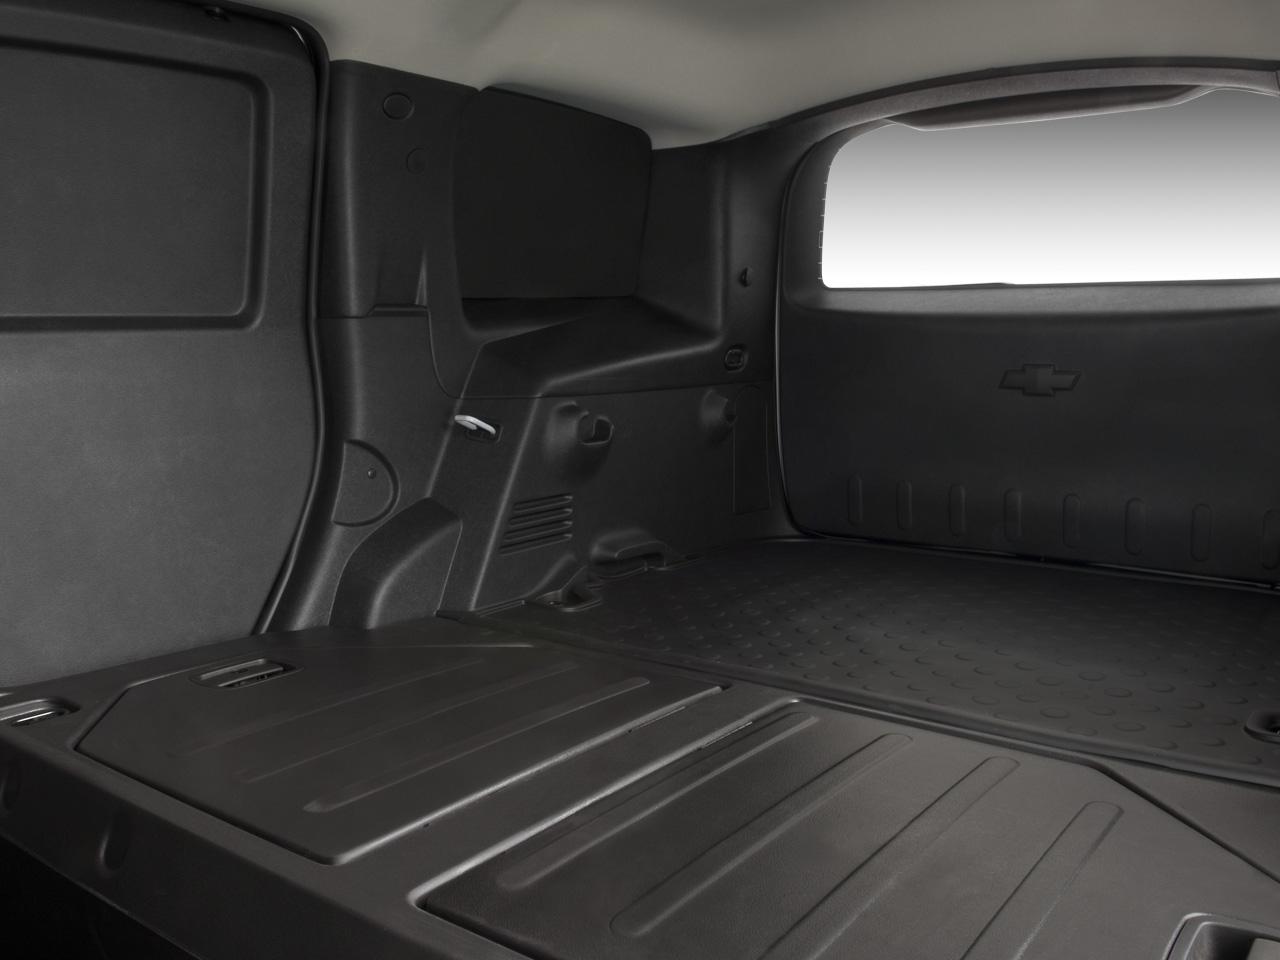 2009 chevrolet hhr panel lt chevy wagon review - Commercial van interiors locations ...